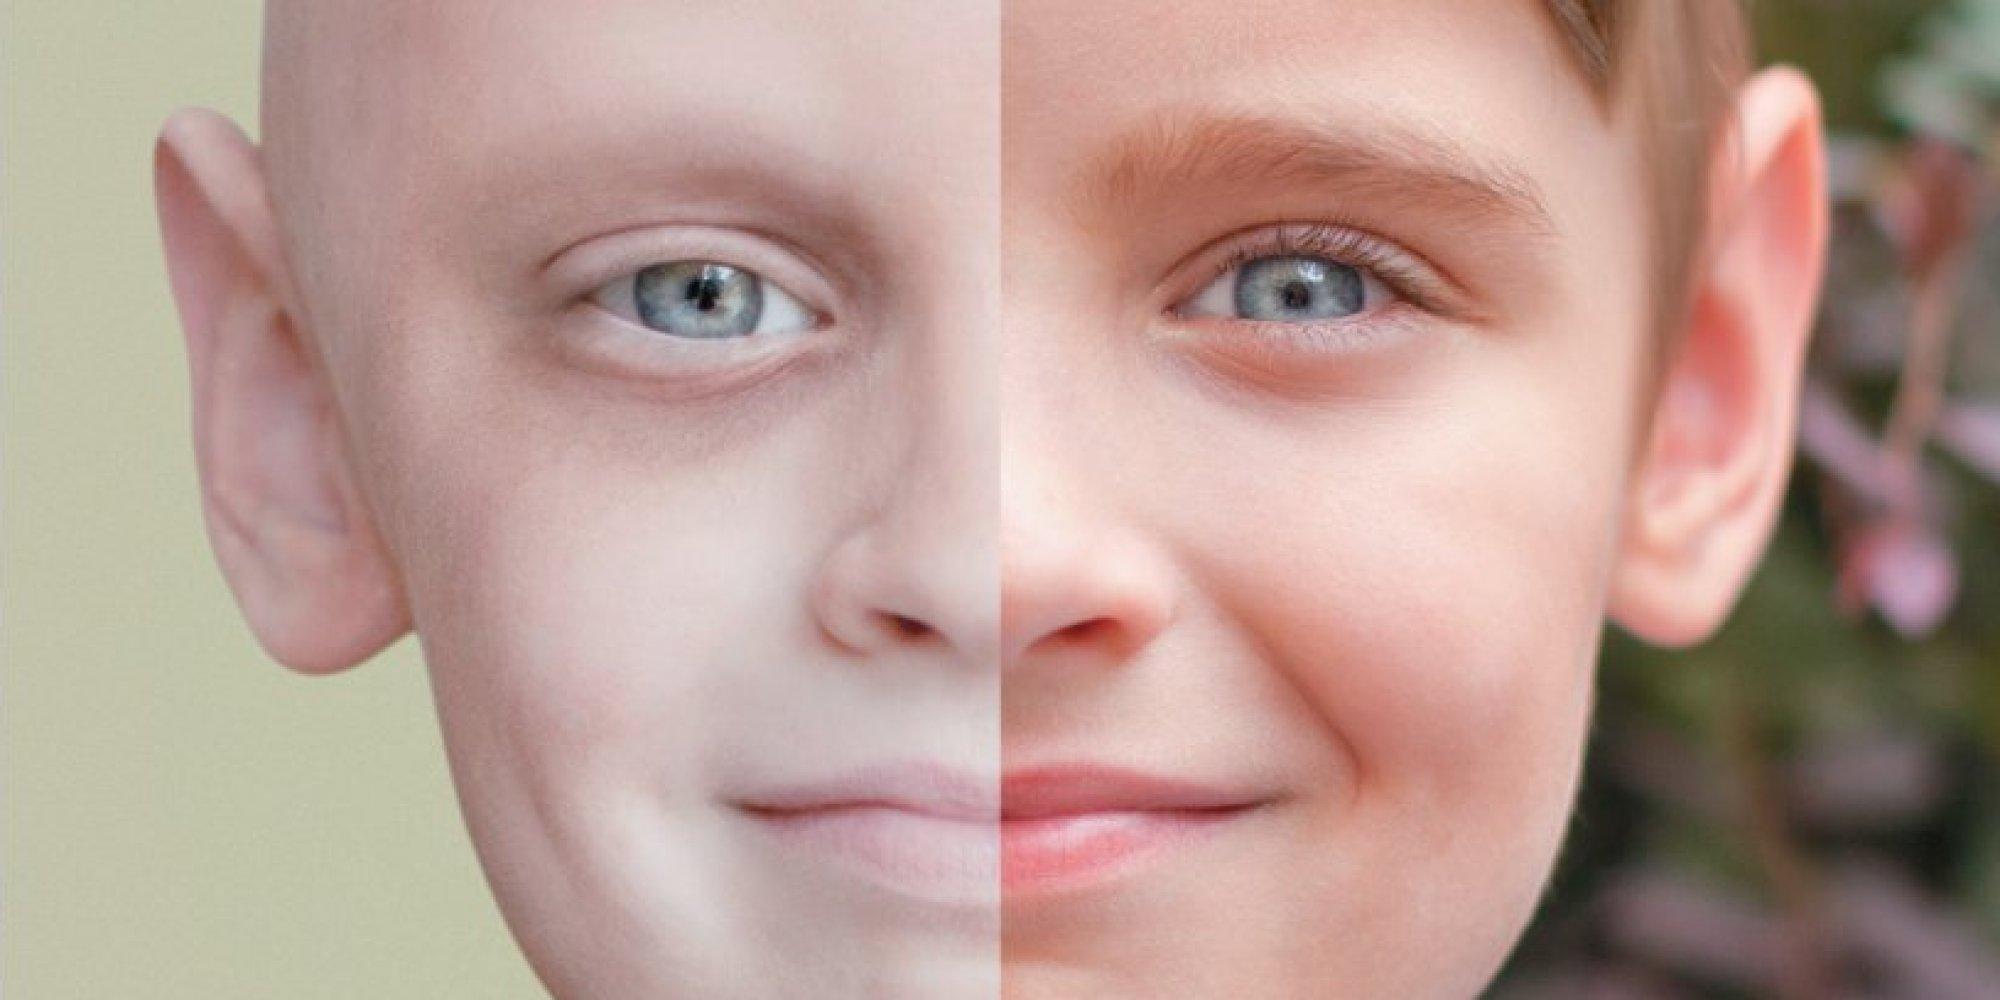 بالصور اخطر انواع السرطان , اشد انواع الامراض الخبيثه خطوره 4065 1